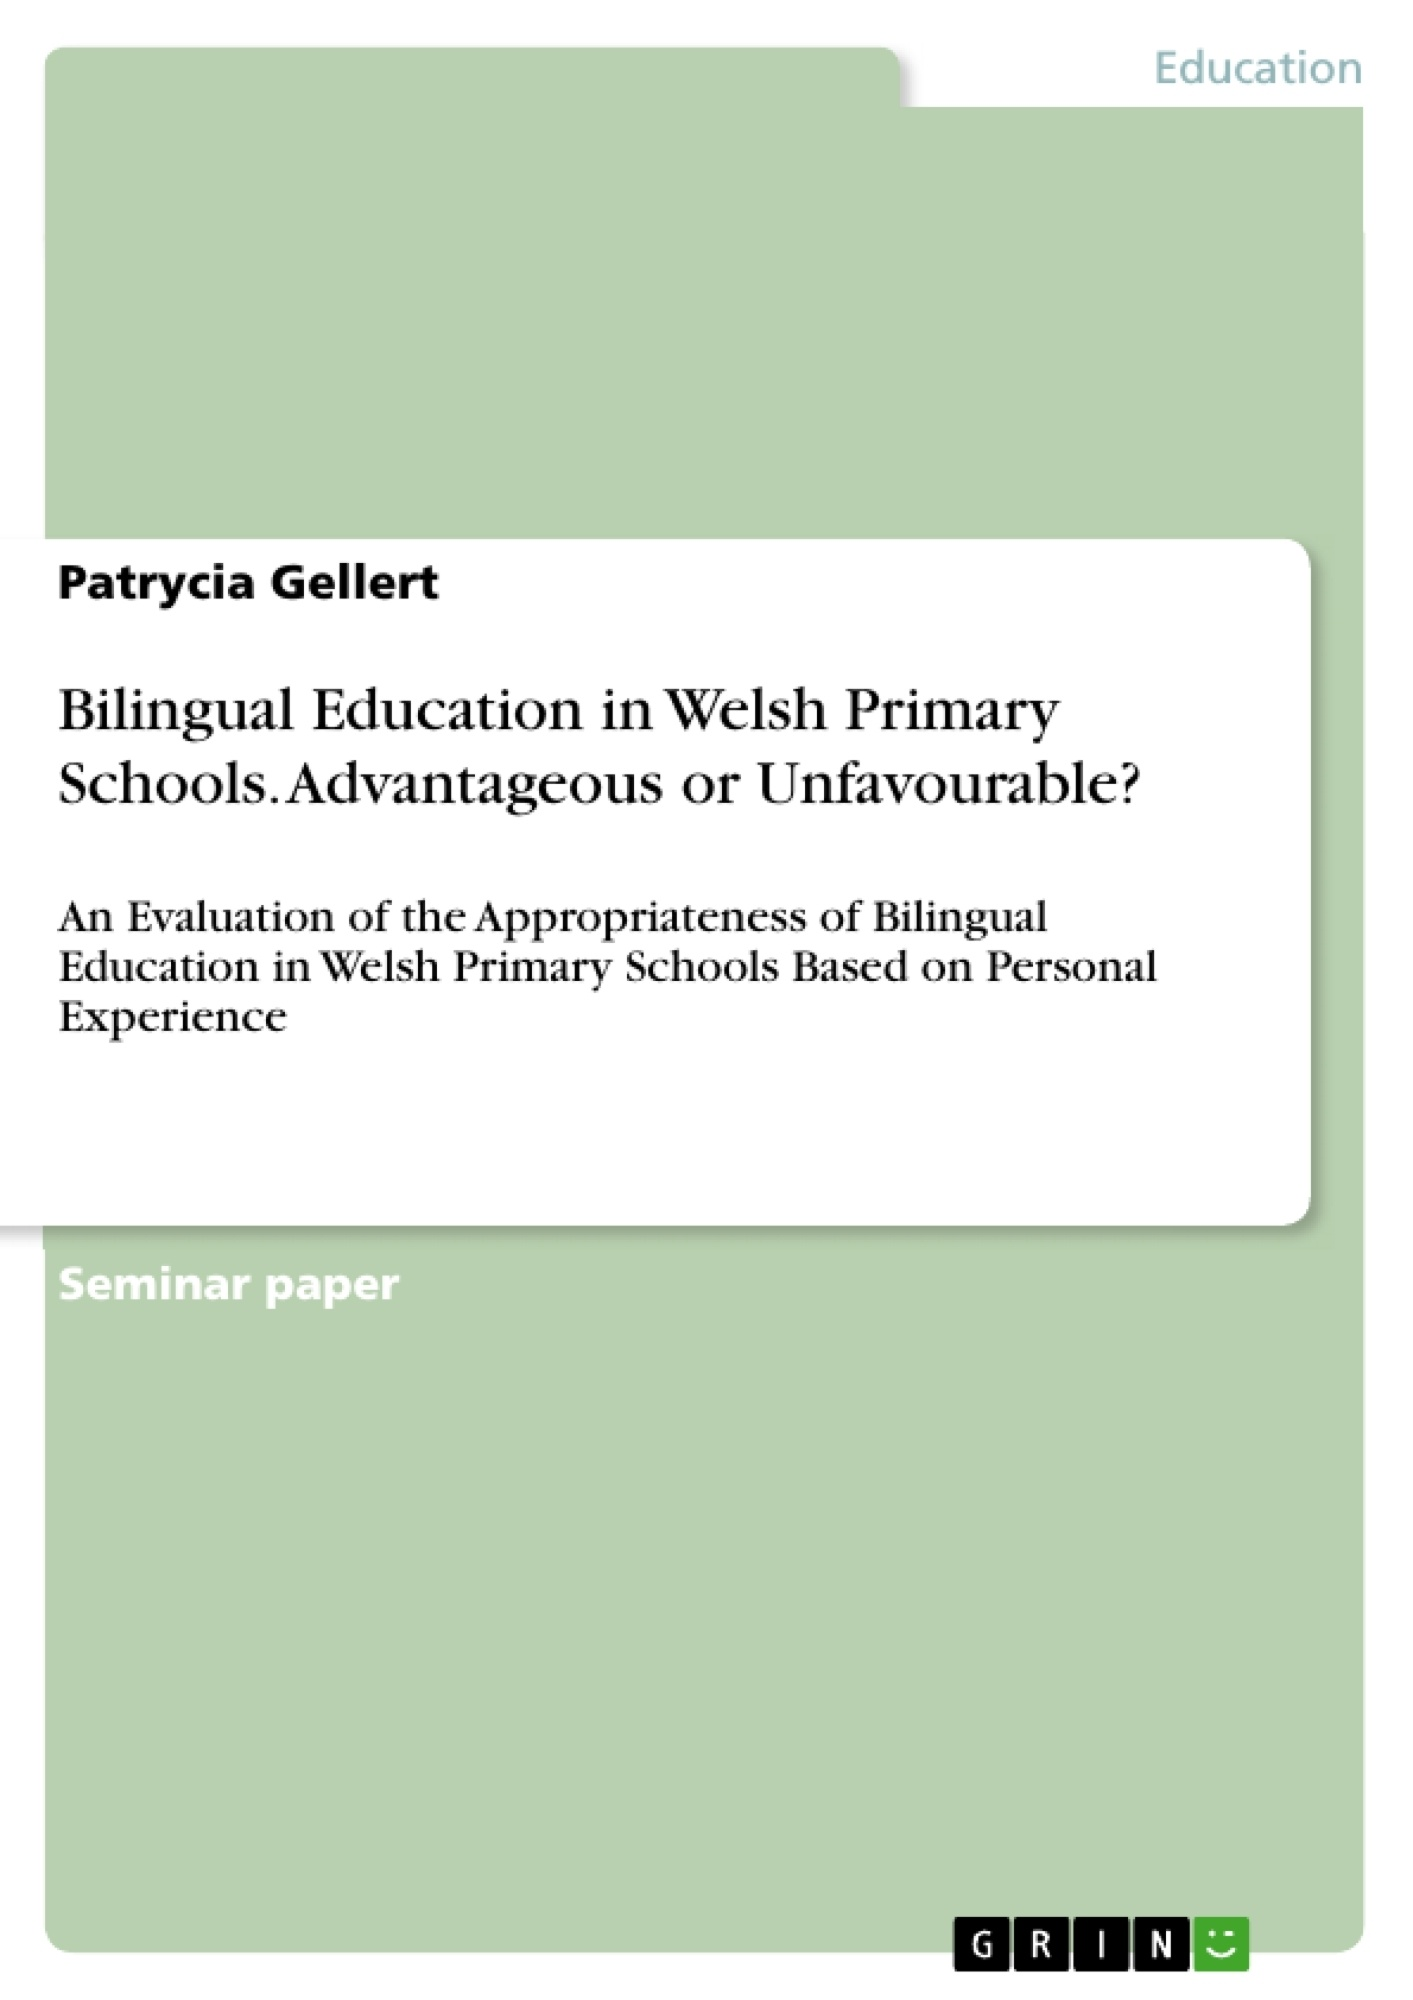 Title: Bilingual Education in Welsh Primary Schools. Advantageous or Unfavourable?